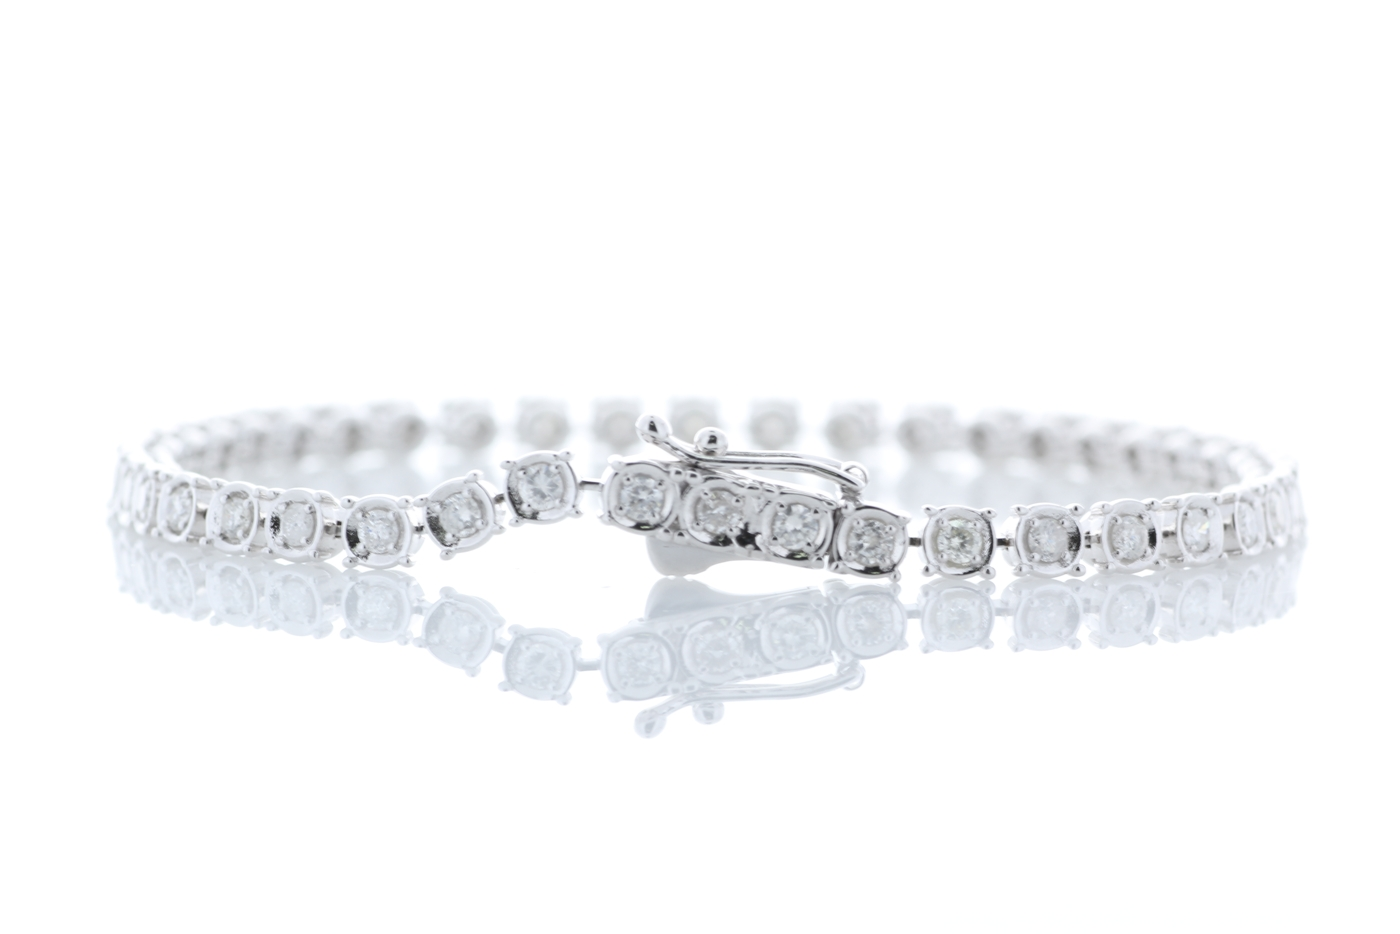 18ct White Gold Tennis Diamond Bracelet 1.50 Carats - Image 3 of 4